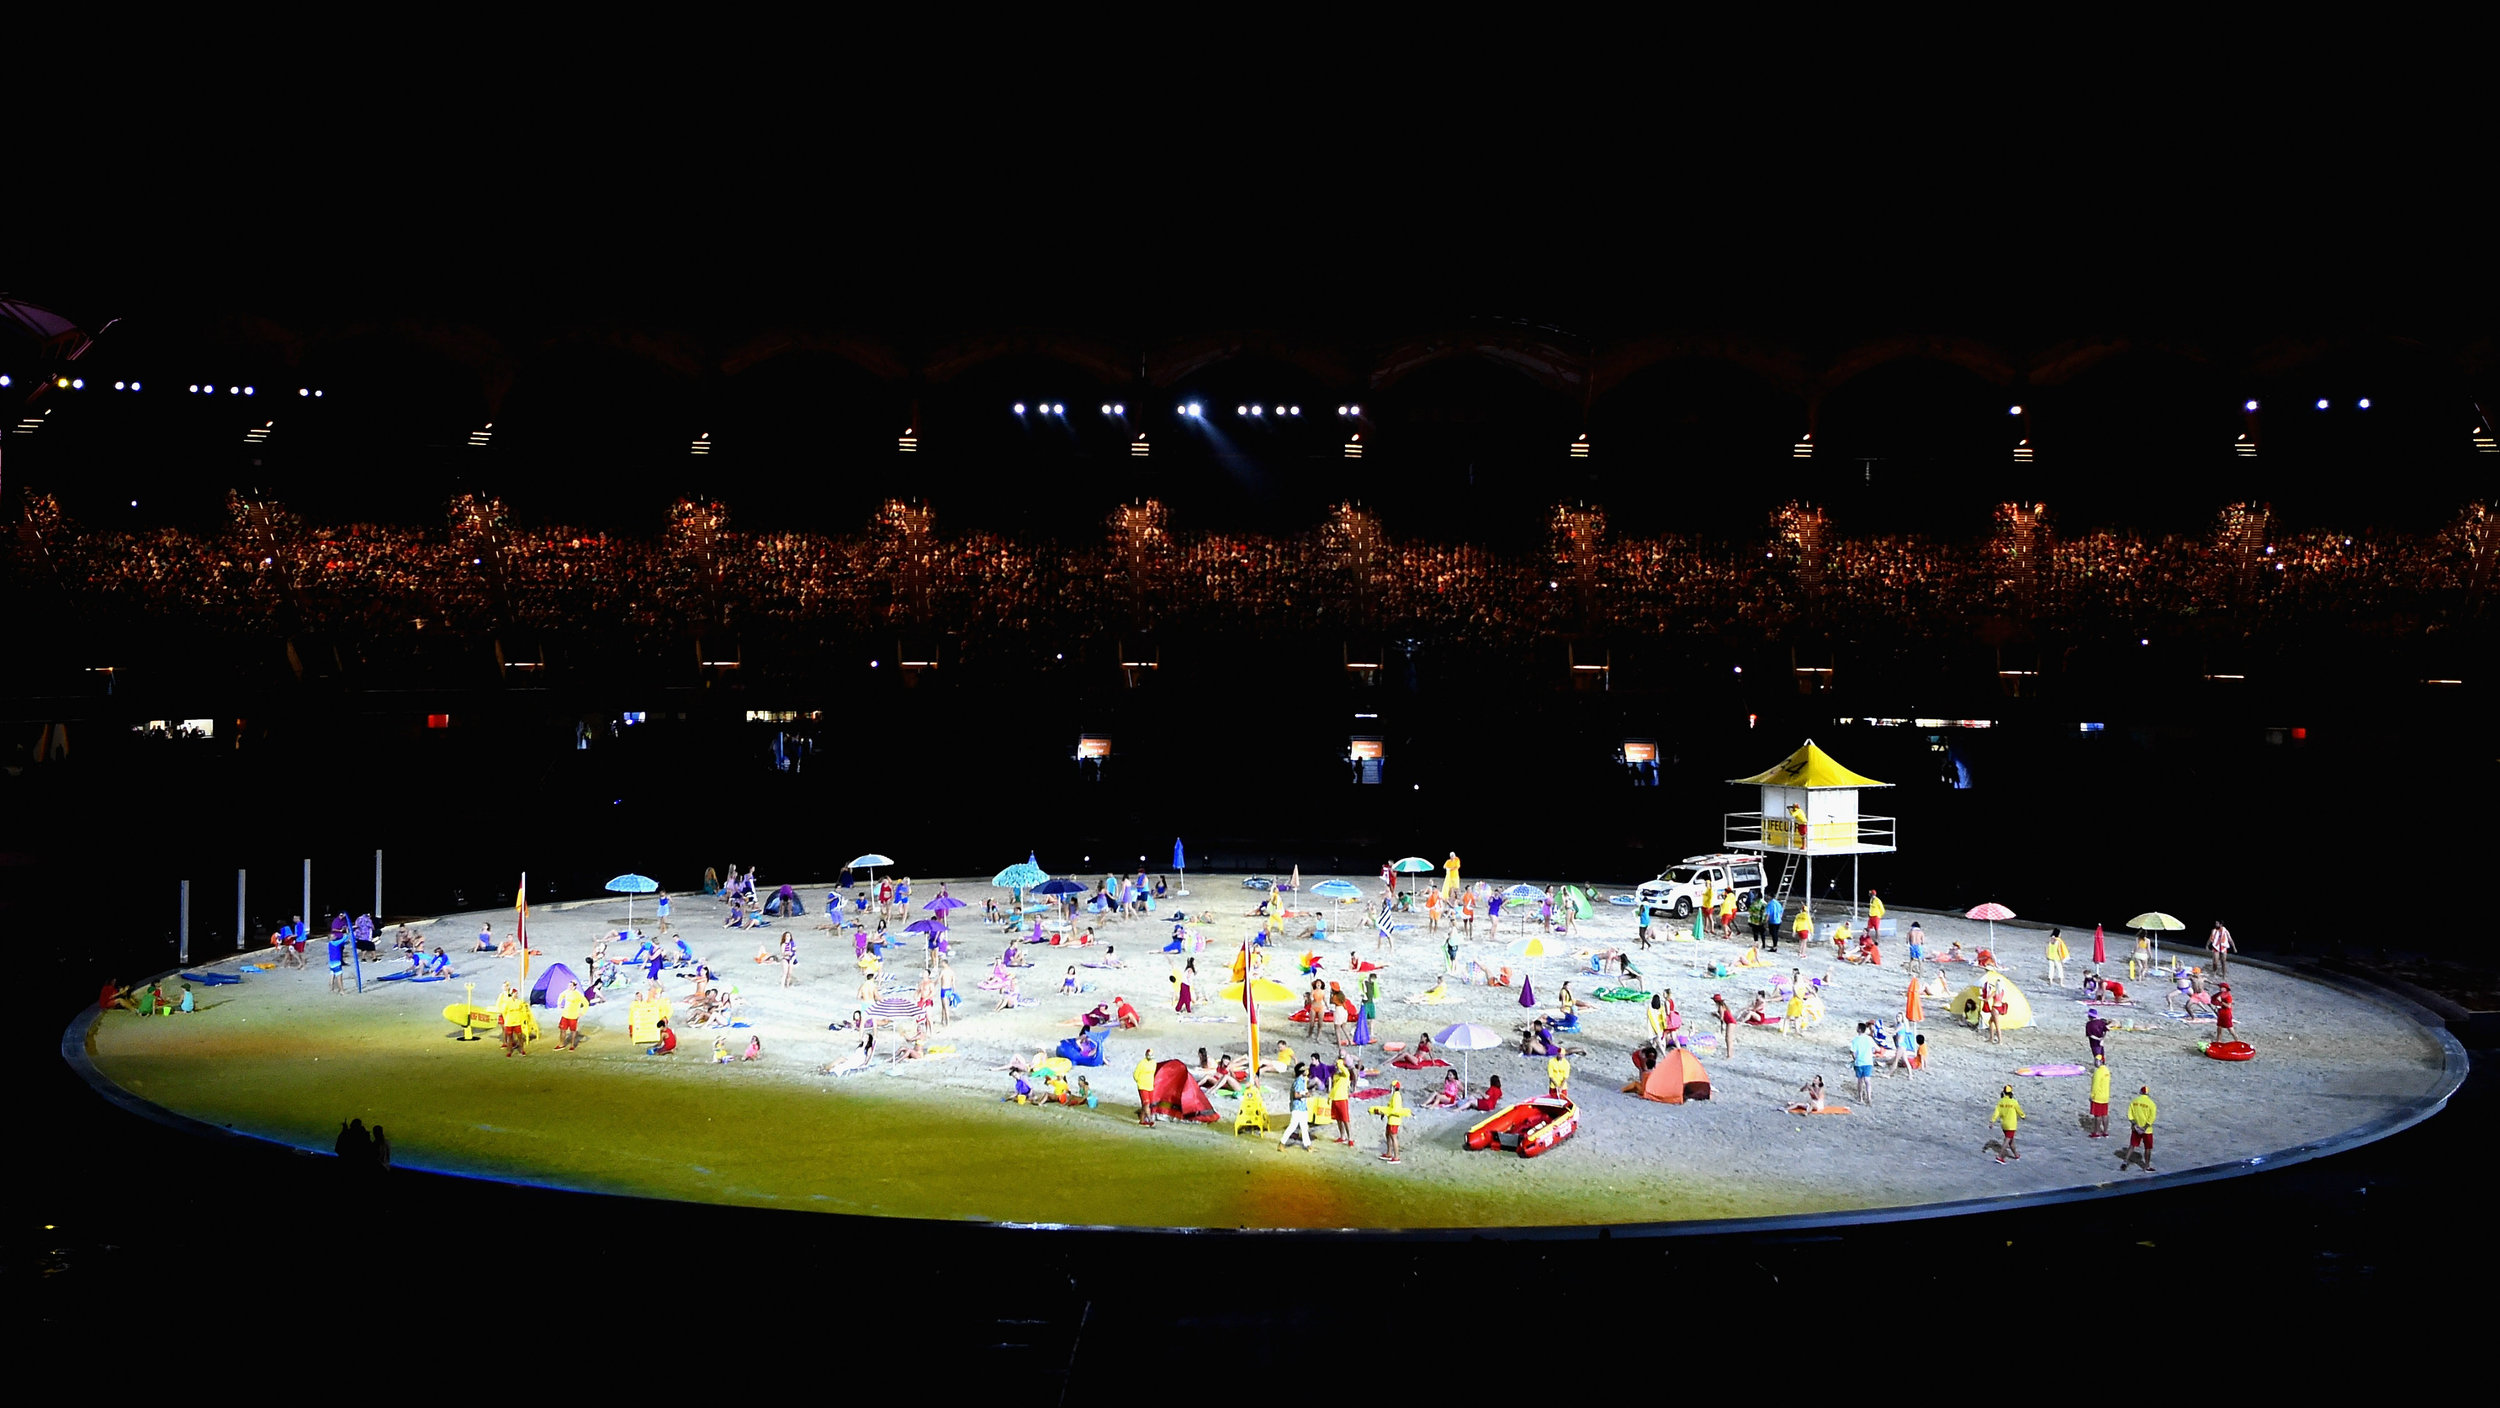 commonwealth-games-opening-ceremony_nozezep23bvw1oc6q9ffzpfwk.jpg